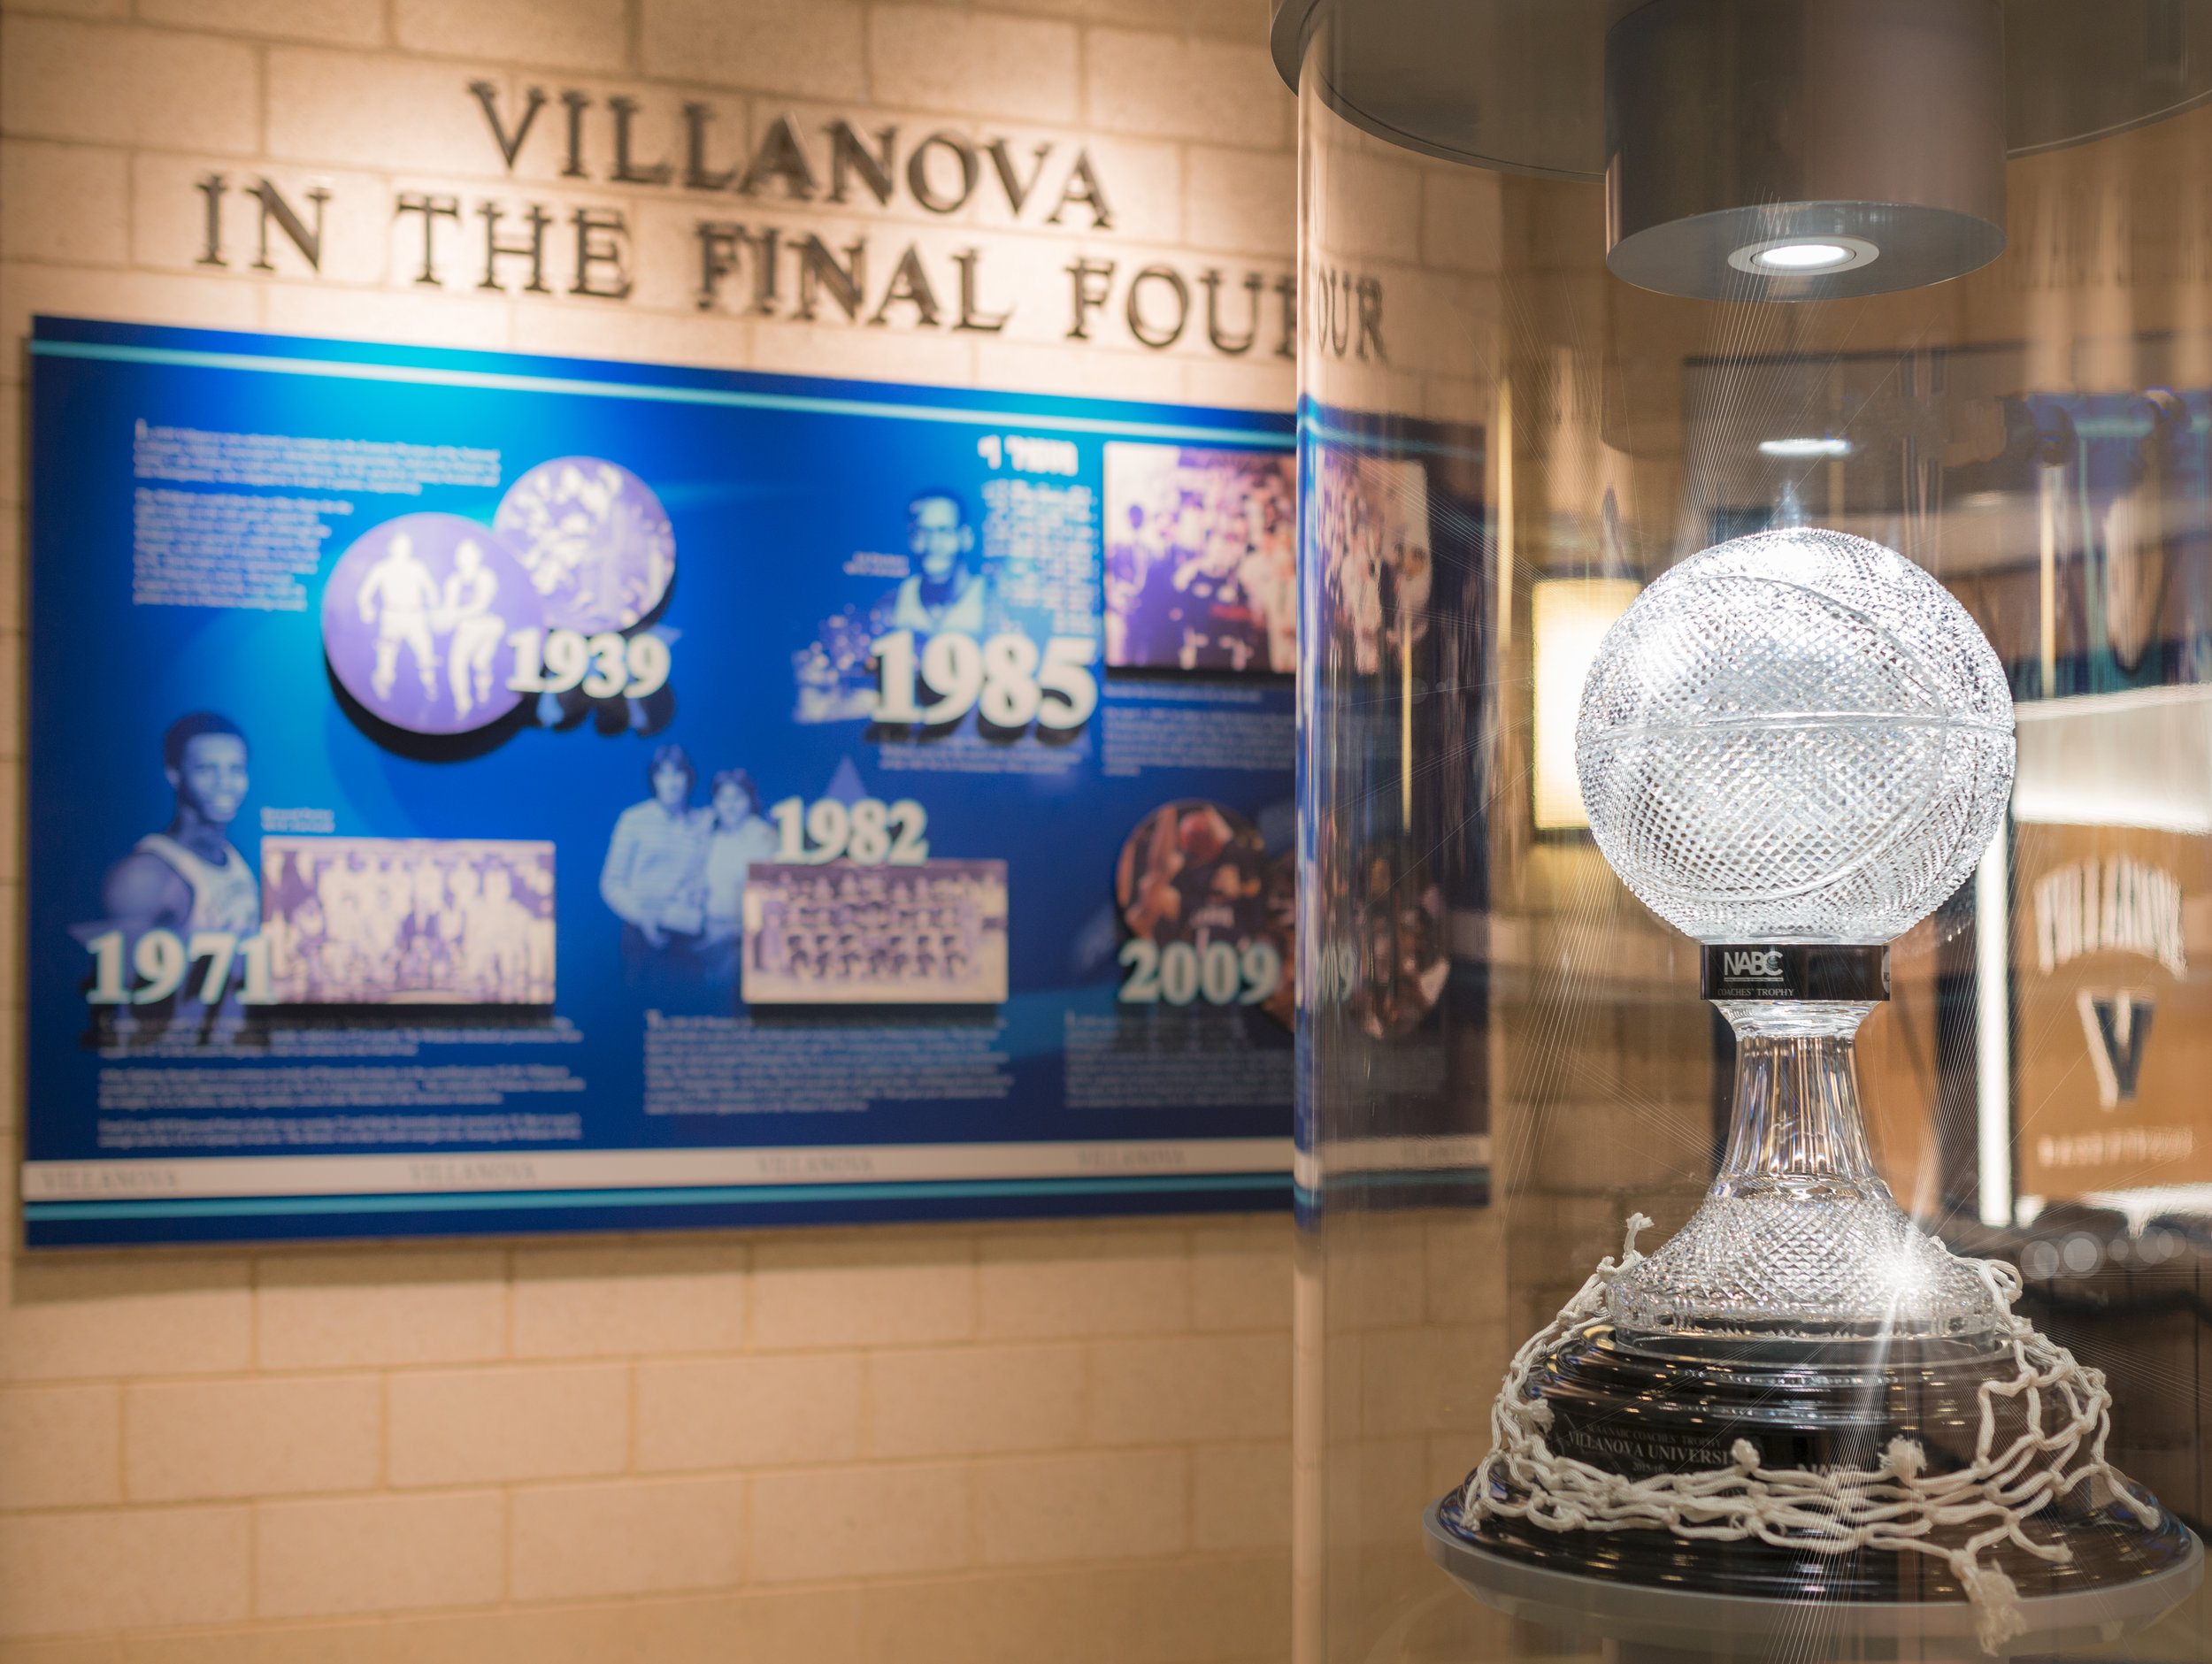 The National Association of Basketball Coaches trophy on display at Villanova University